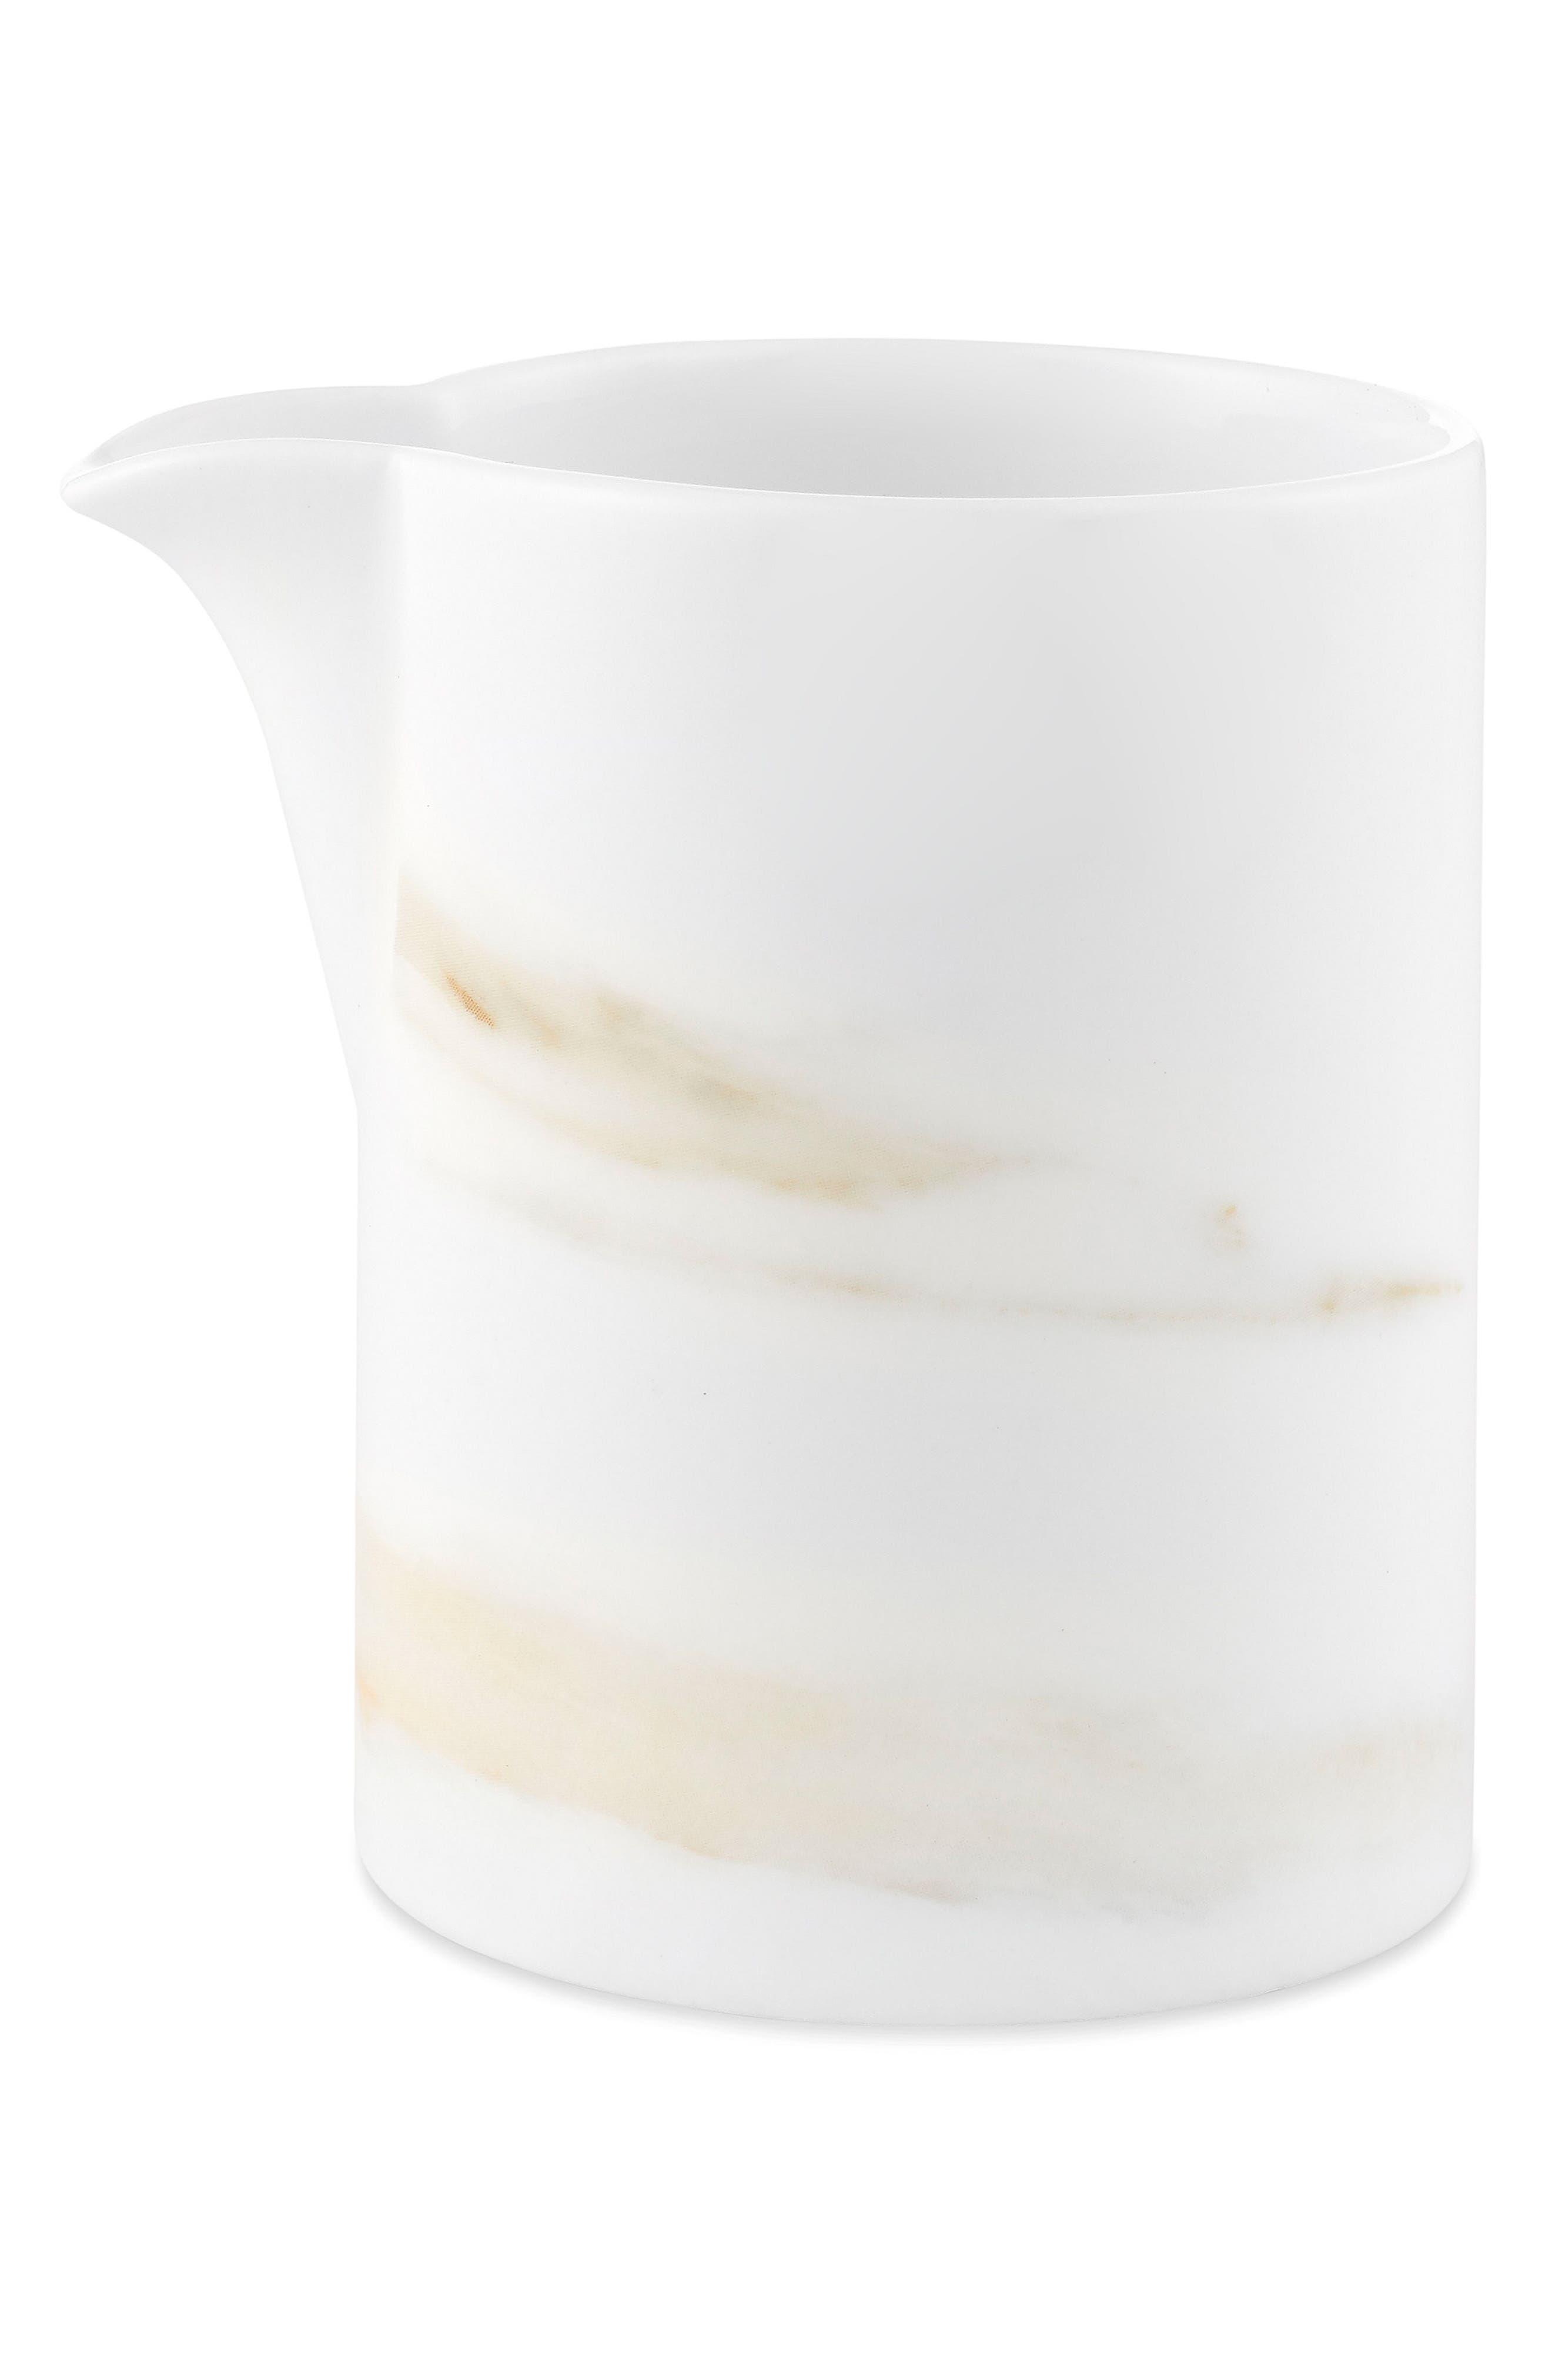 Vera Wang x Wedgwood Venato Imperial Creamer